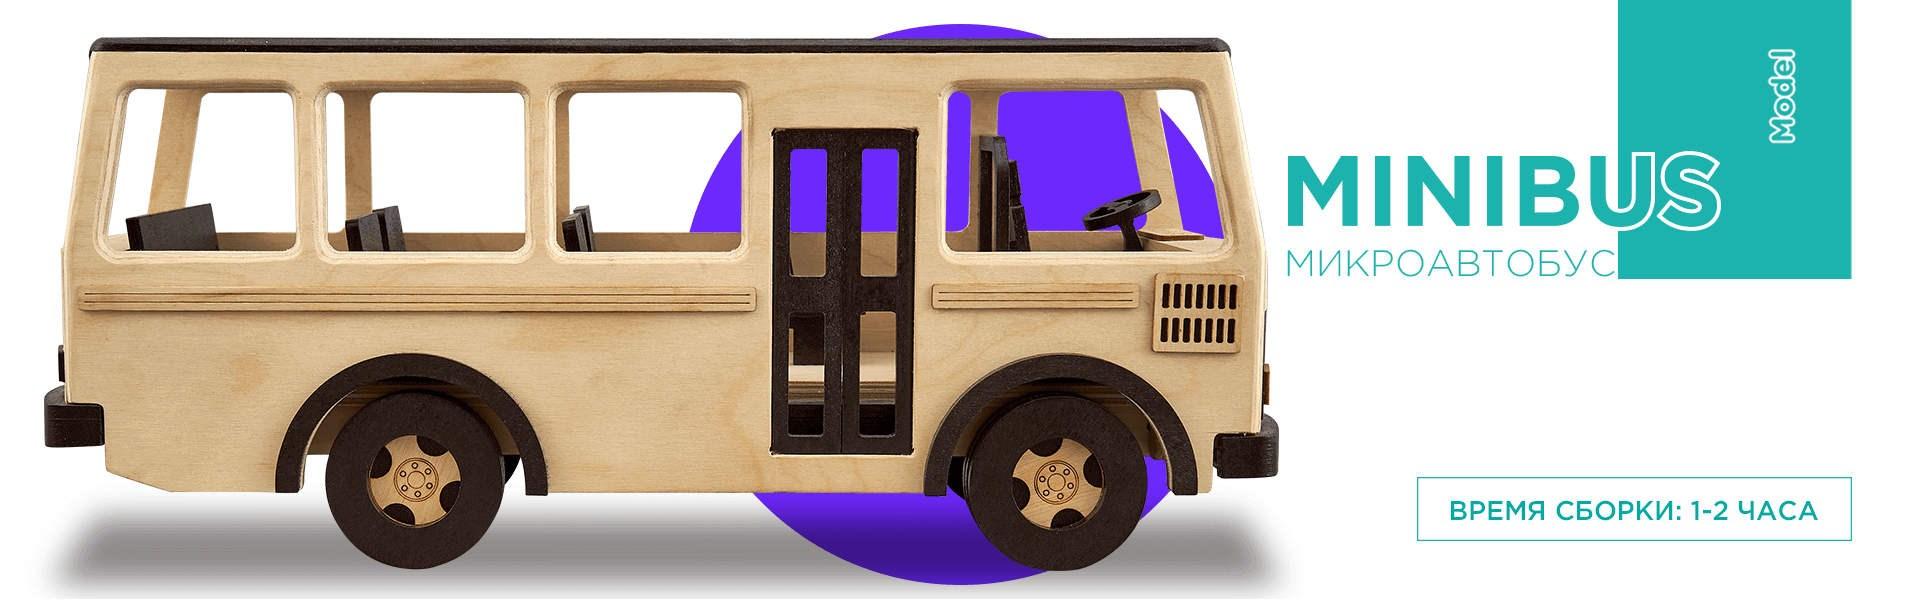 Сборная модель T.A.R.G. Minibus - фото 4961